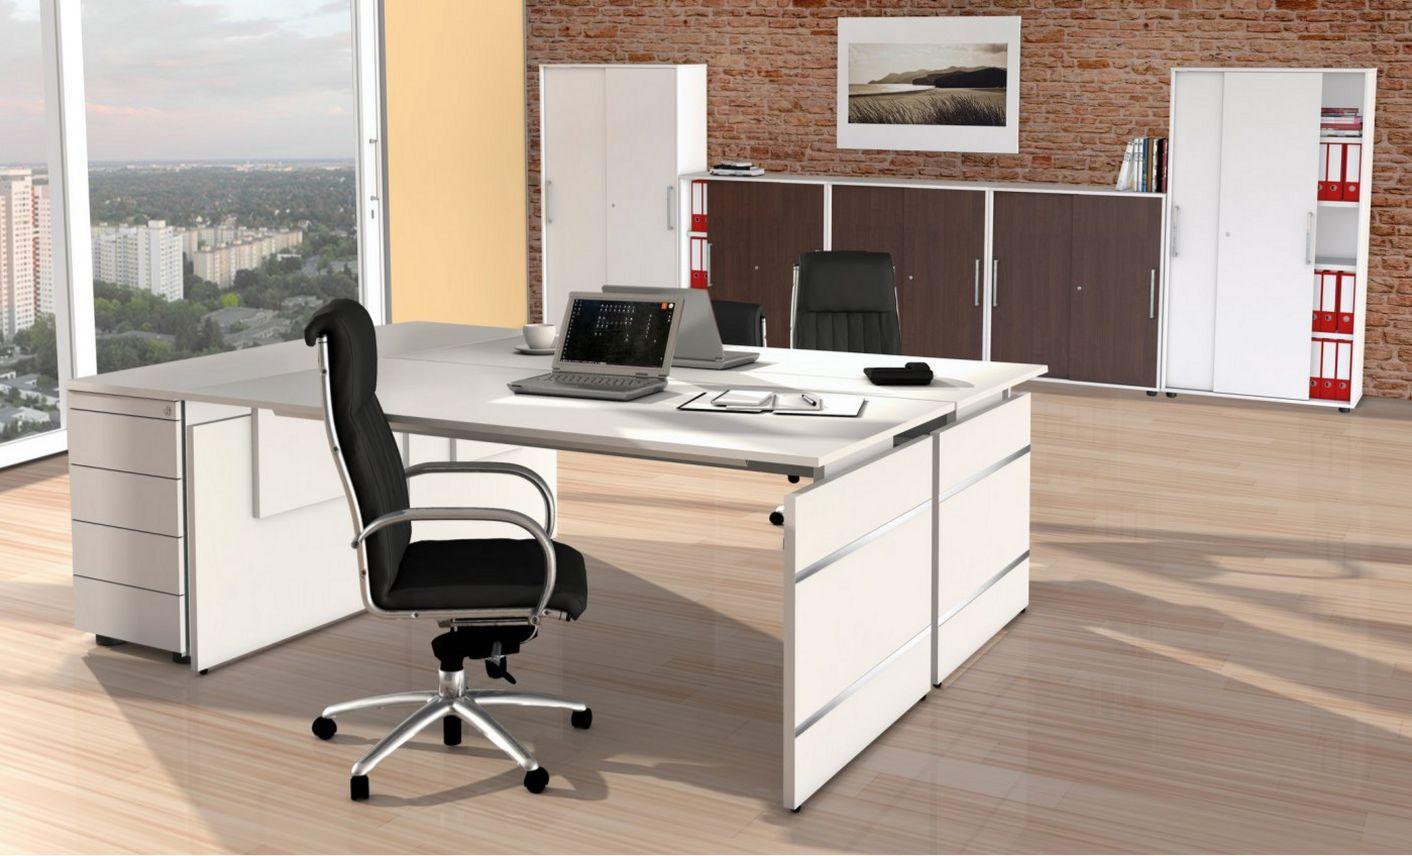 günstige Büroschränke abschließbare Schiebetüren